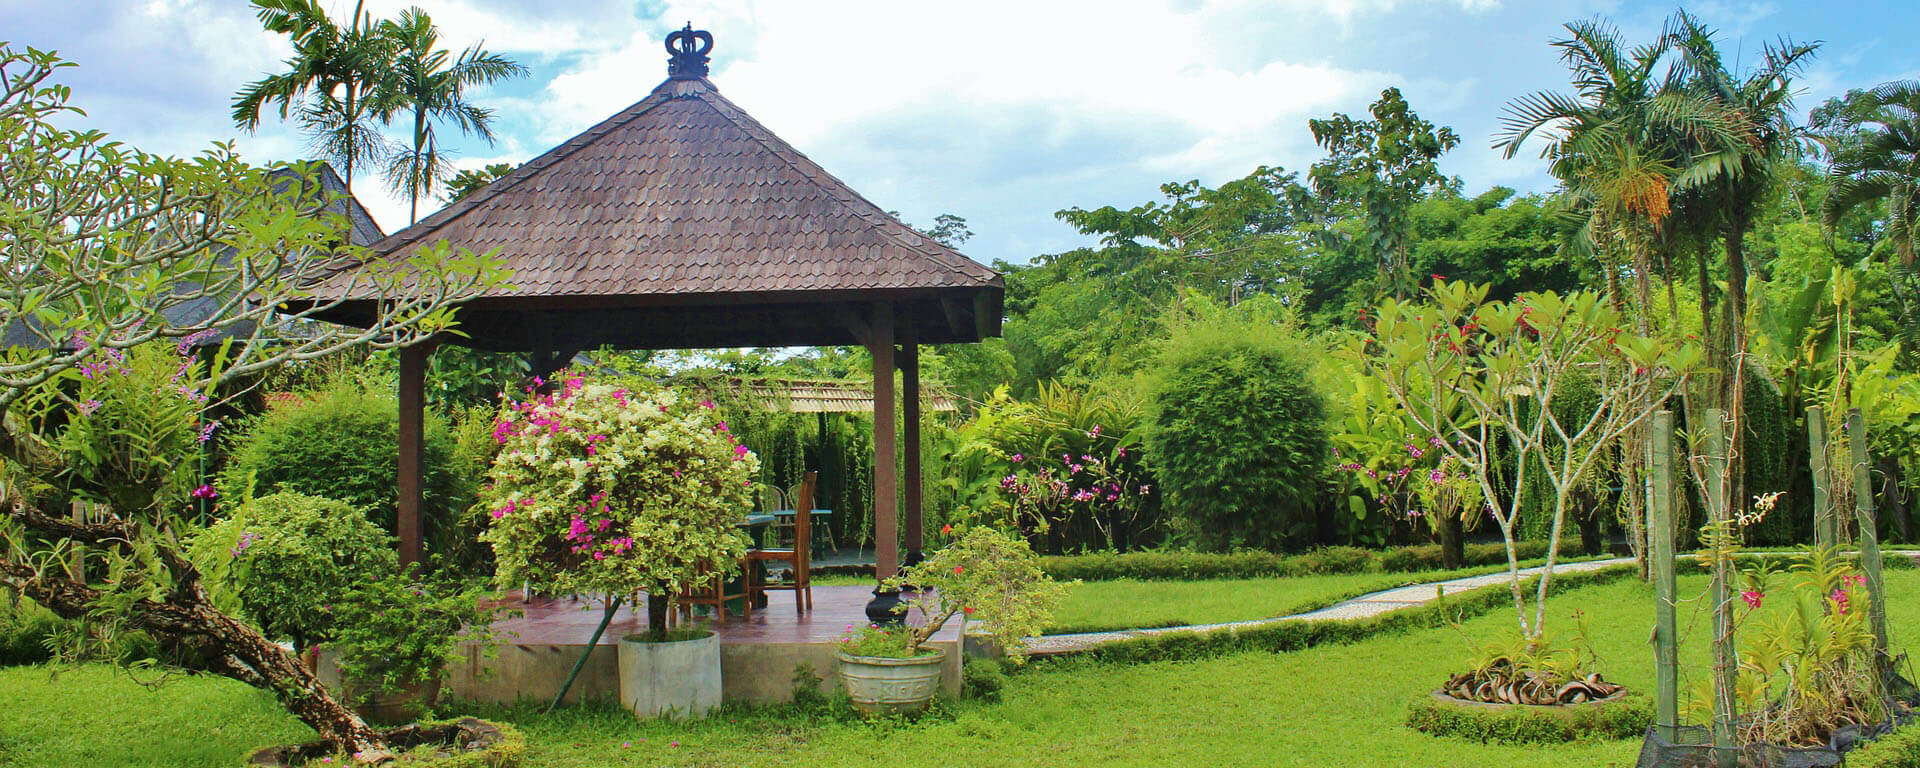 6-tips-to-create-a-Balinese-inspired-garden-4.jpg